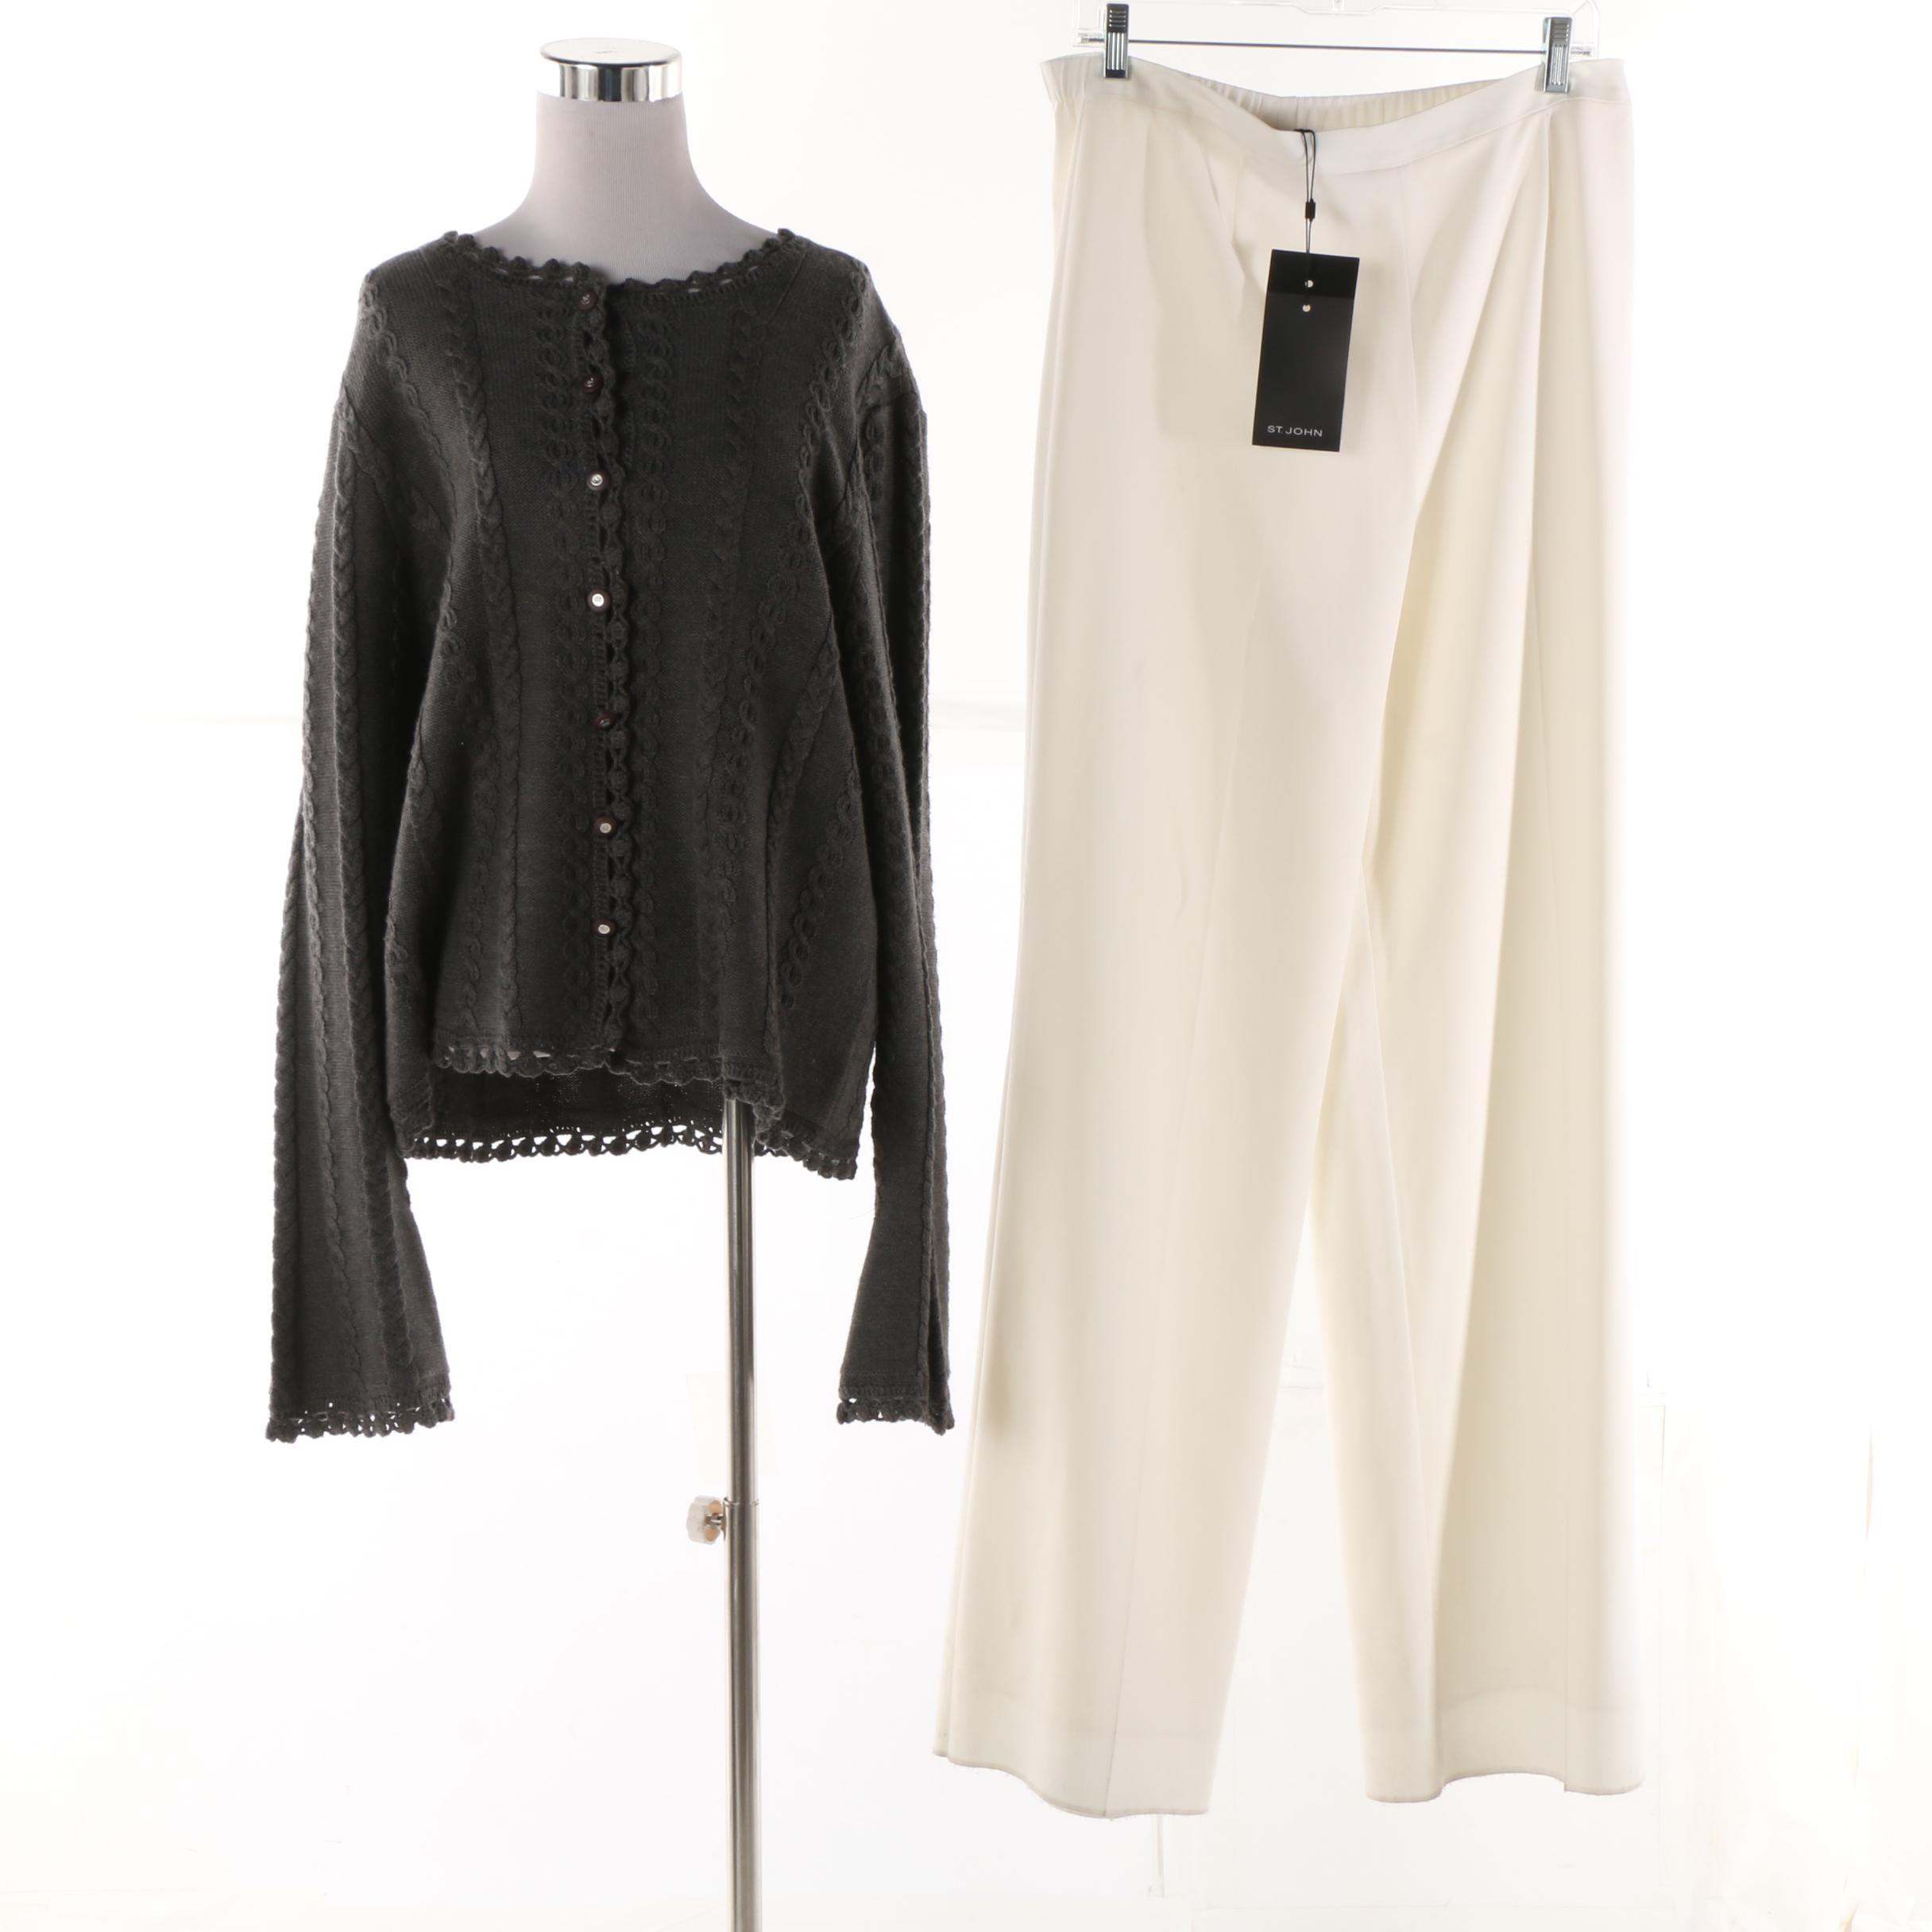 St. John Collection Gray Knit Cardigan and St. John Winter White Pants